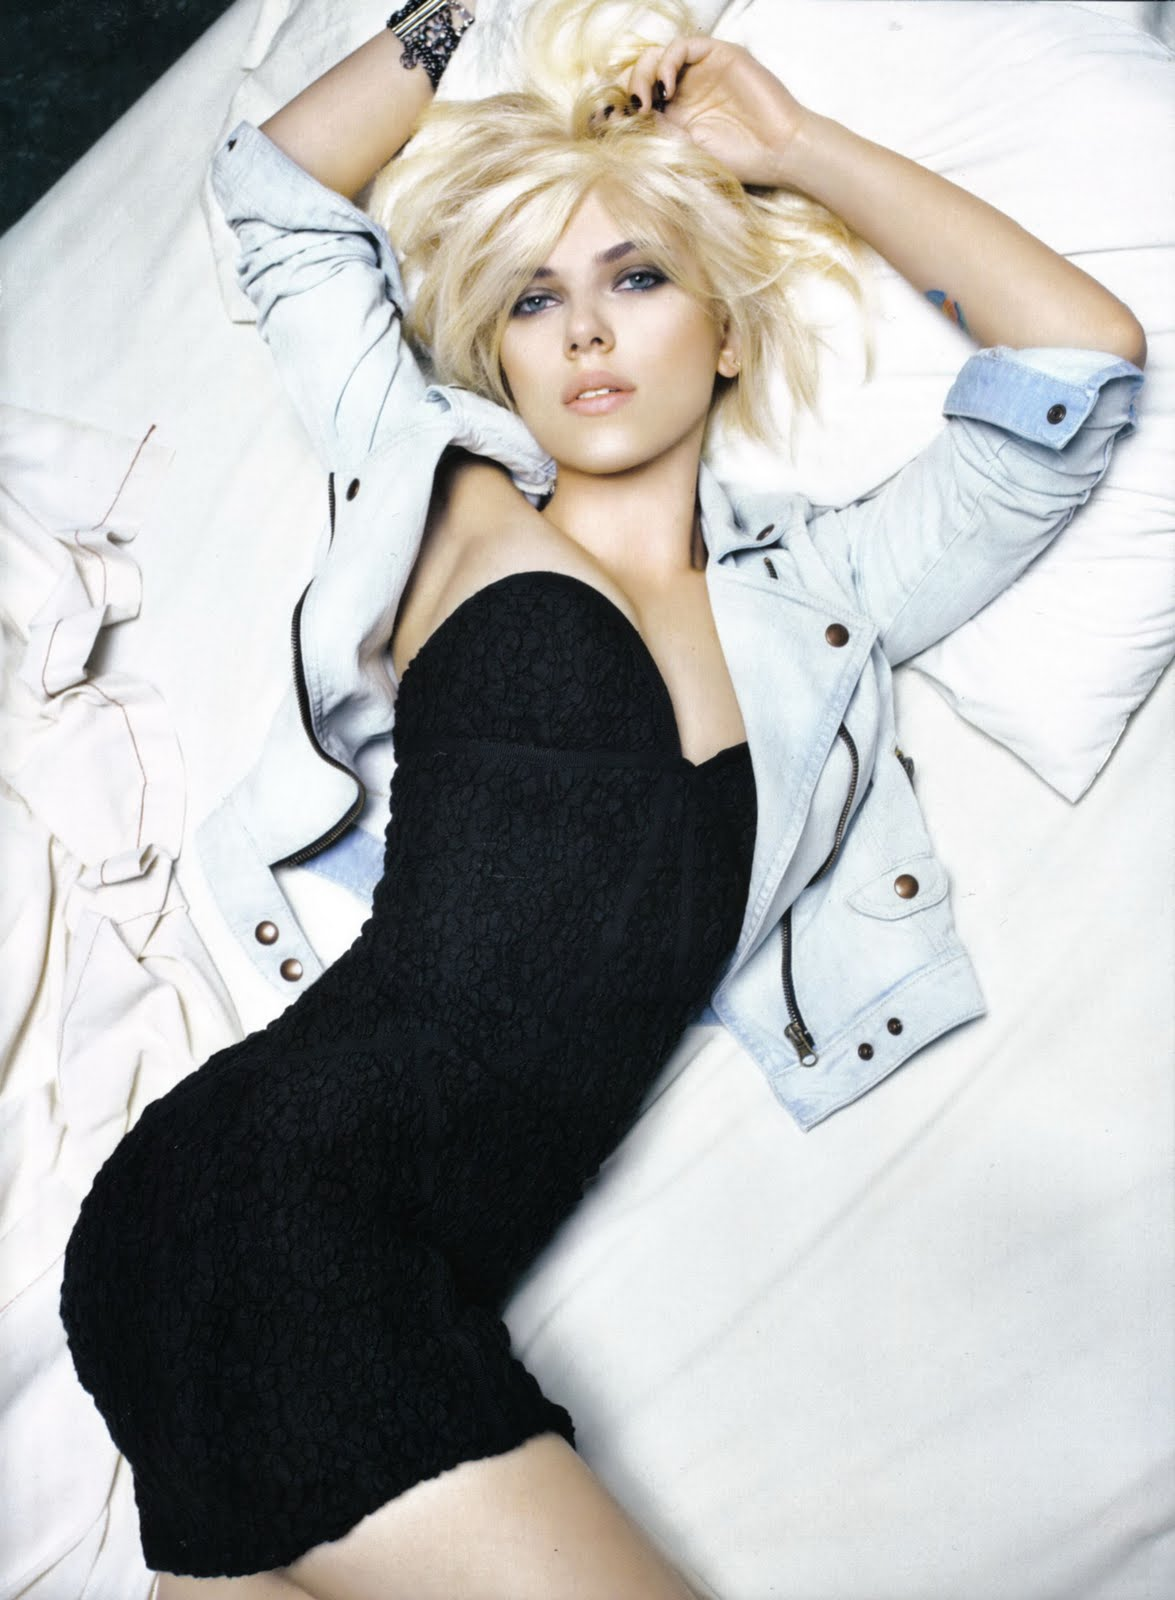 http://1.bp.blogspot.com/_YzoNgr0eLEo/TU5hqGU8ImI/AAAAAAAAHrQ/xGzUo2g4OiU/s1600/42919_Scarlett_Johansson_Mango_Promoshoot-2010_122_545lo.jpg